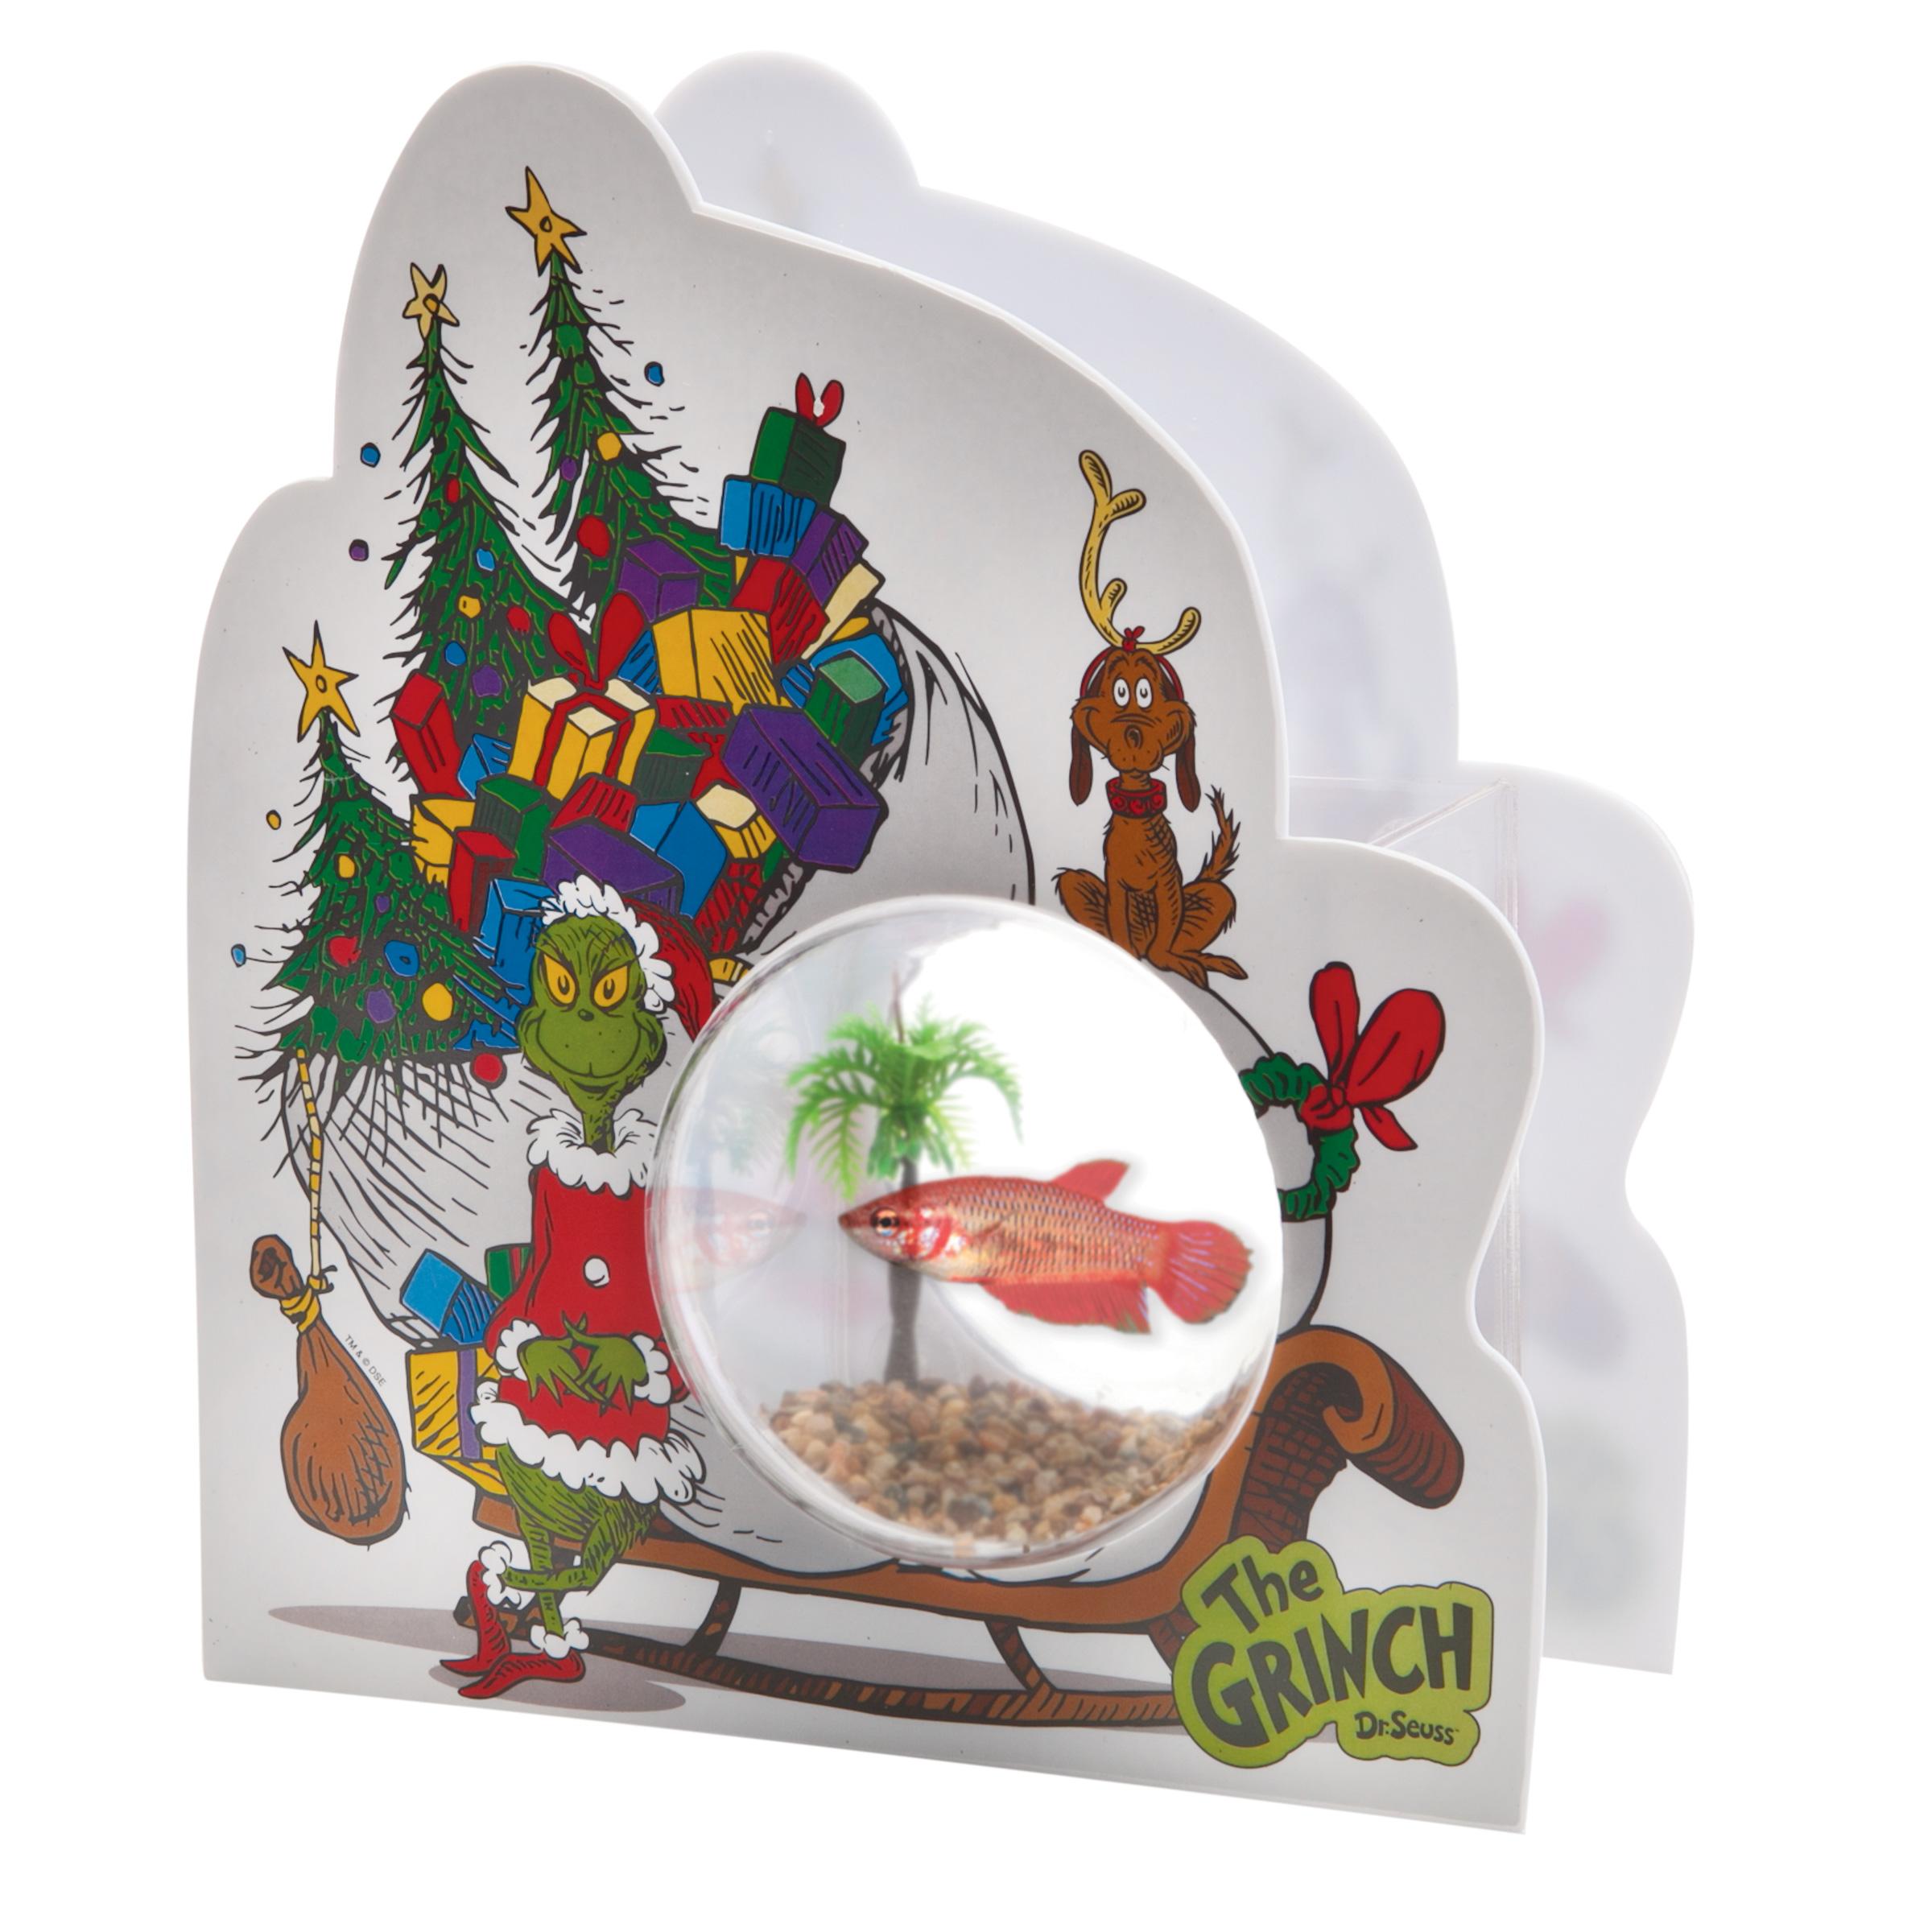 Holiday gift guide petsmart grinch max fish bowl for Fish bowl pets